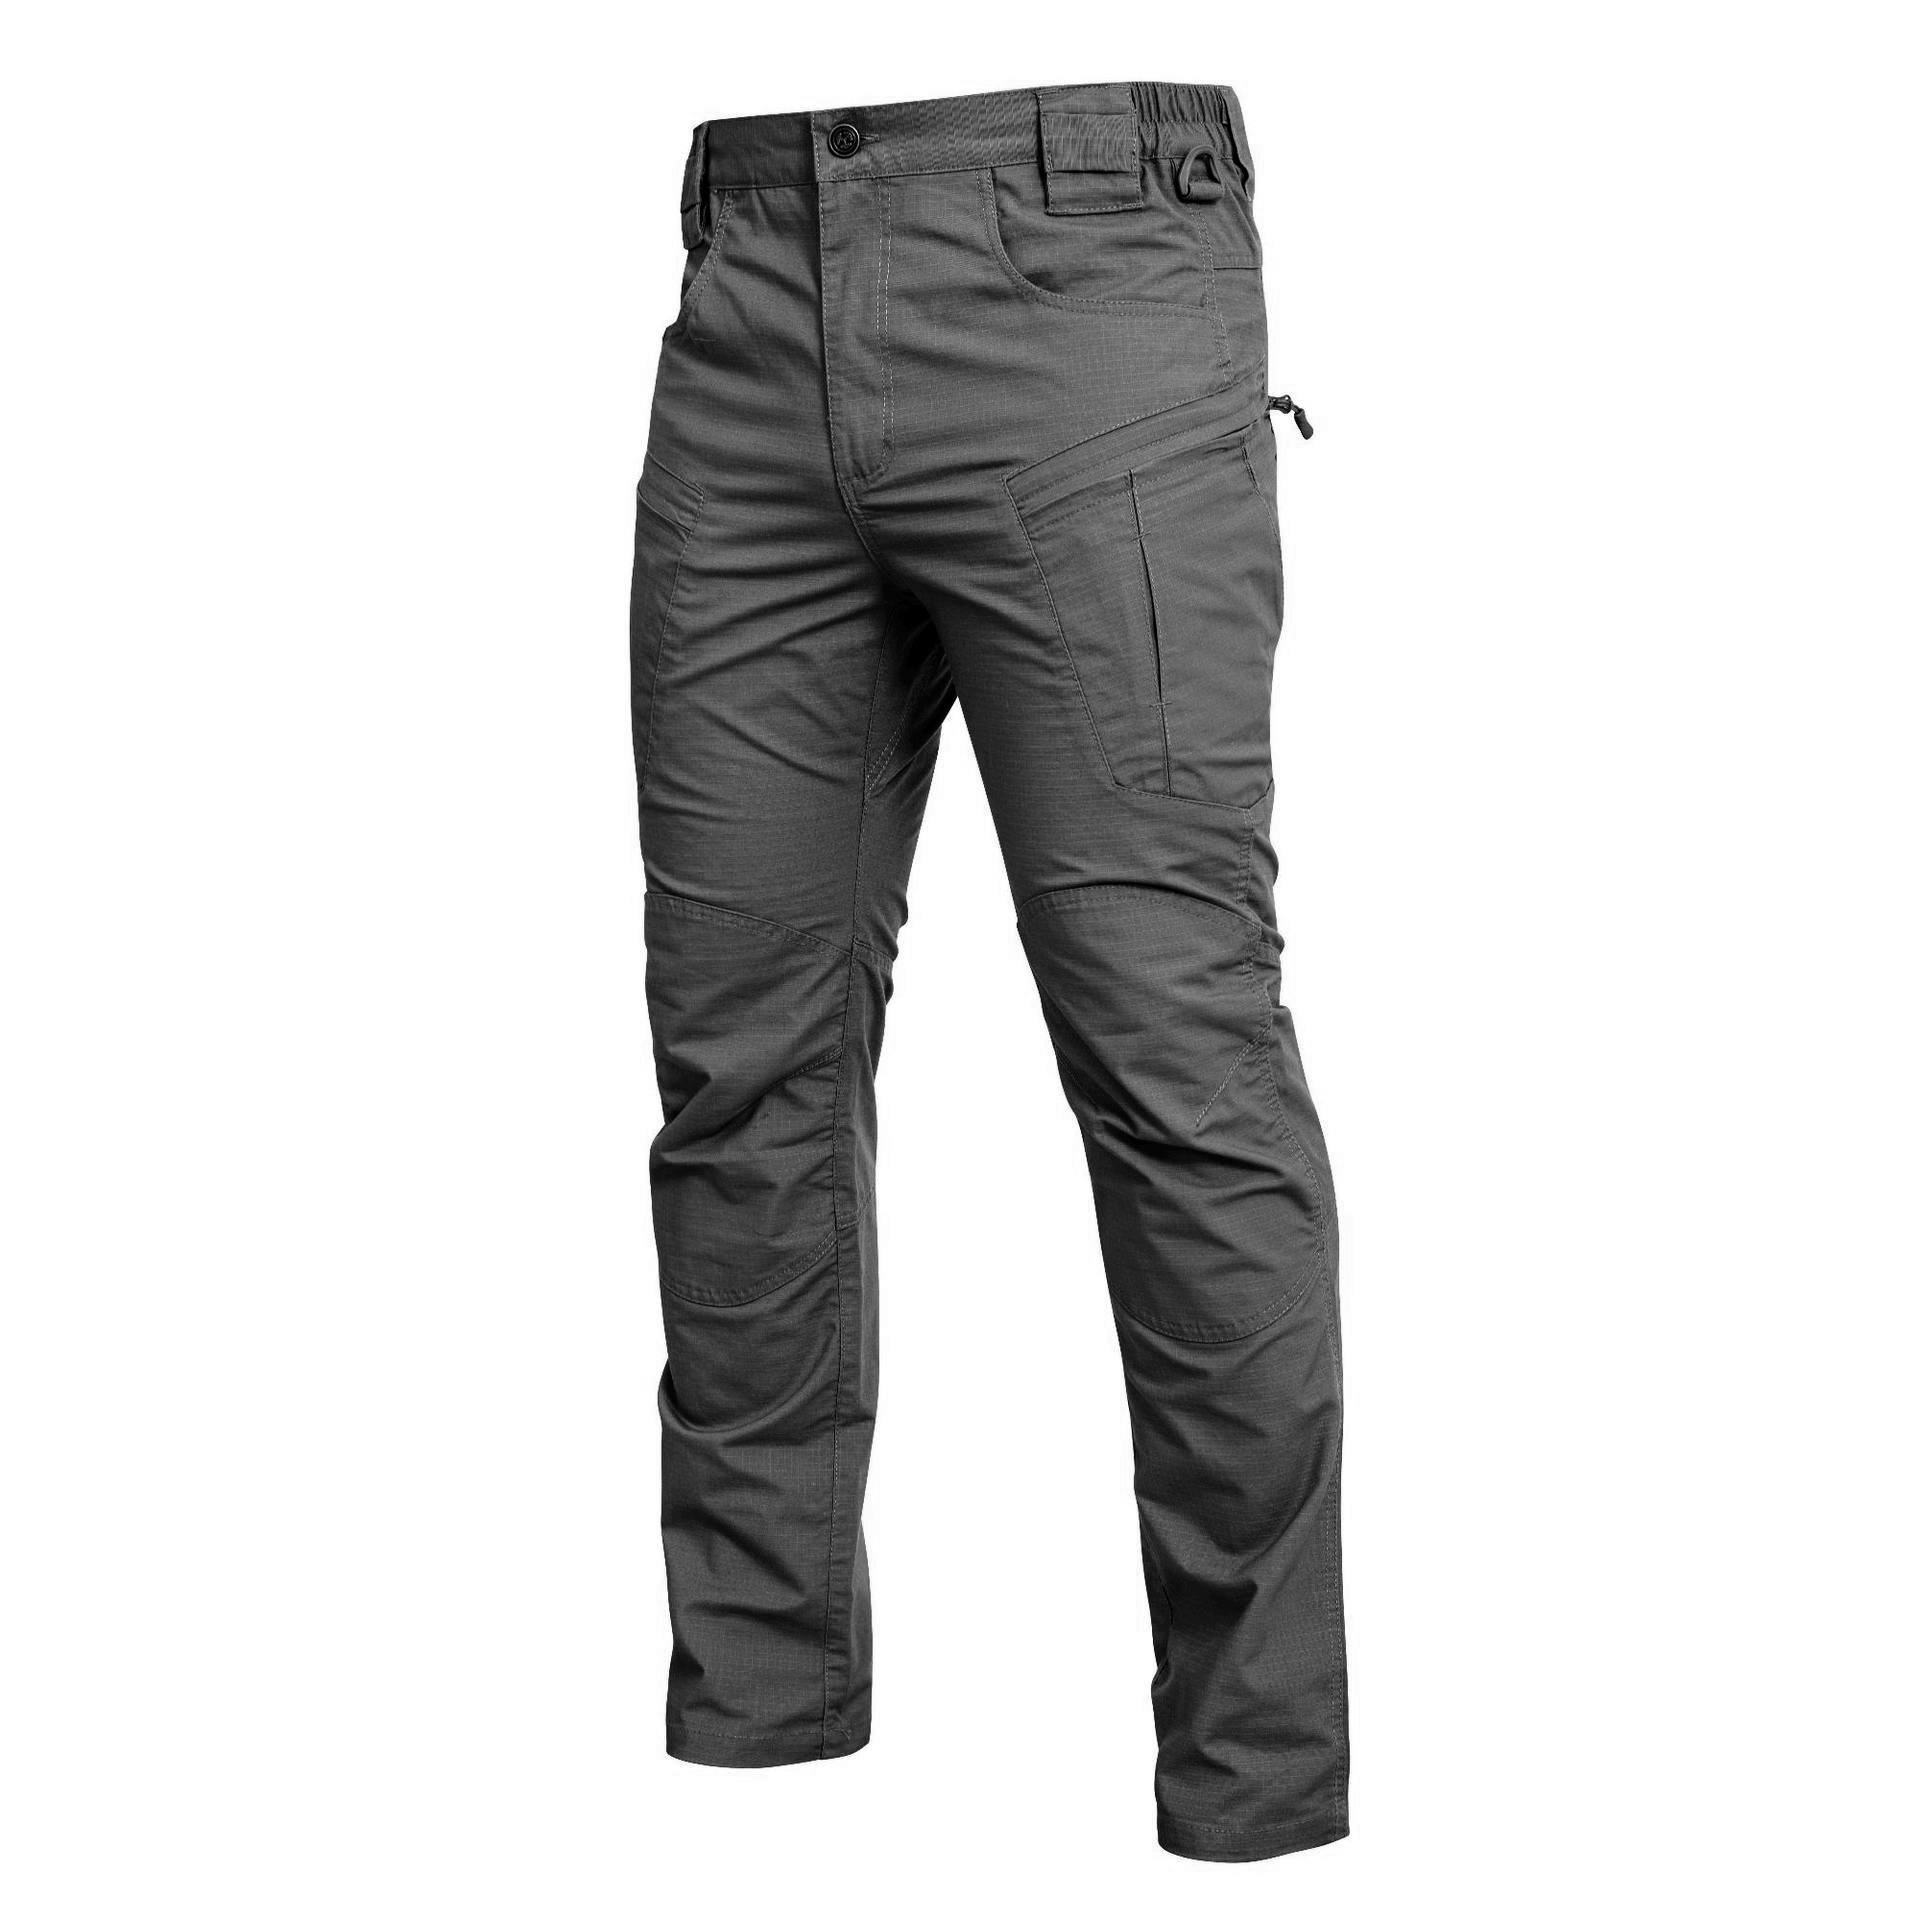 PAVEHAWK Summer X5 Cargo Pants Men Army Military Tactical Pants Streetwear Jogger Trekking Hiking Mountain Work Tourism Trousers